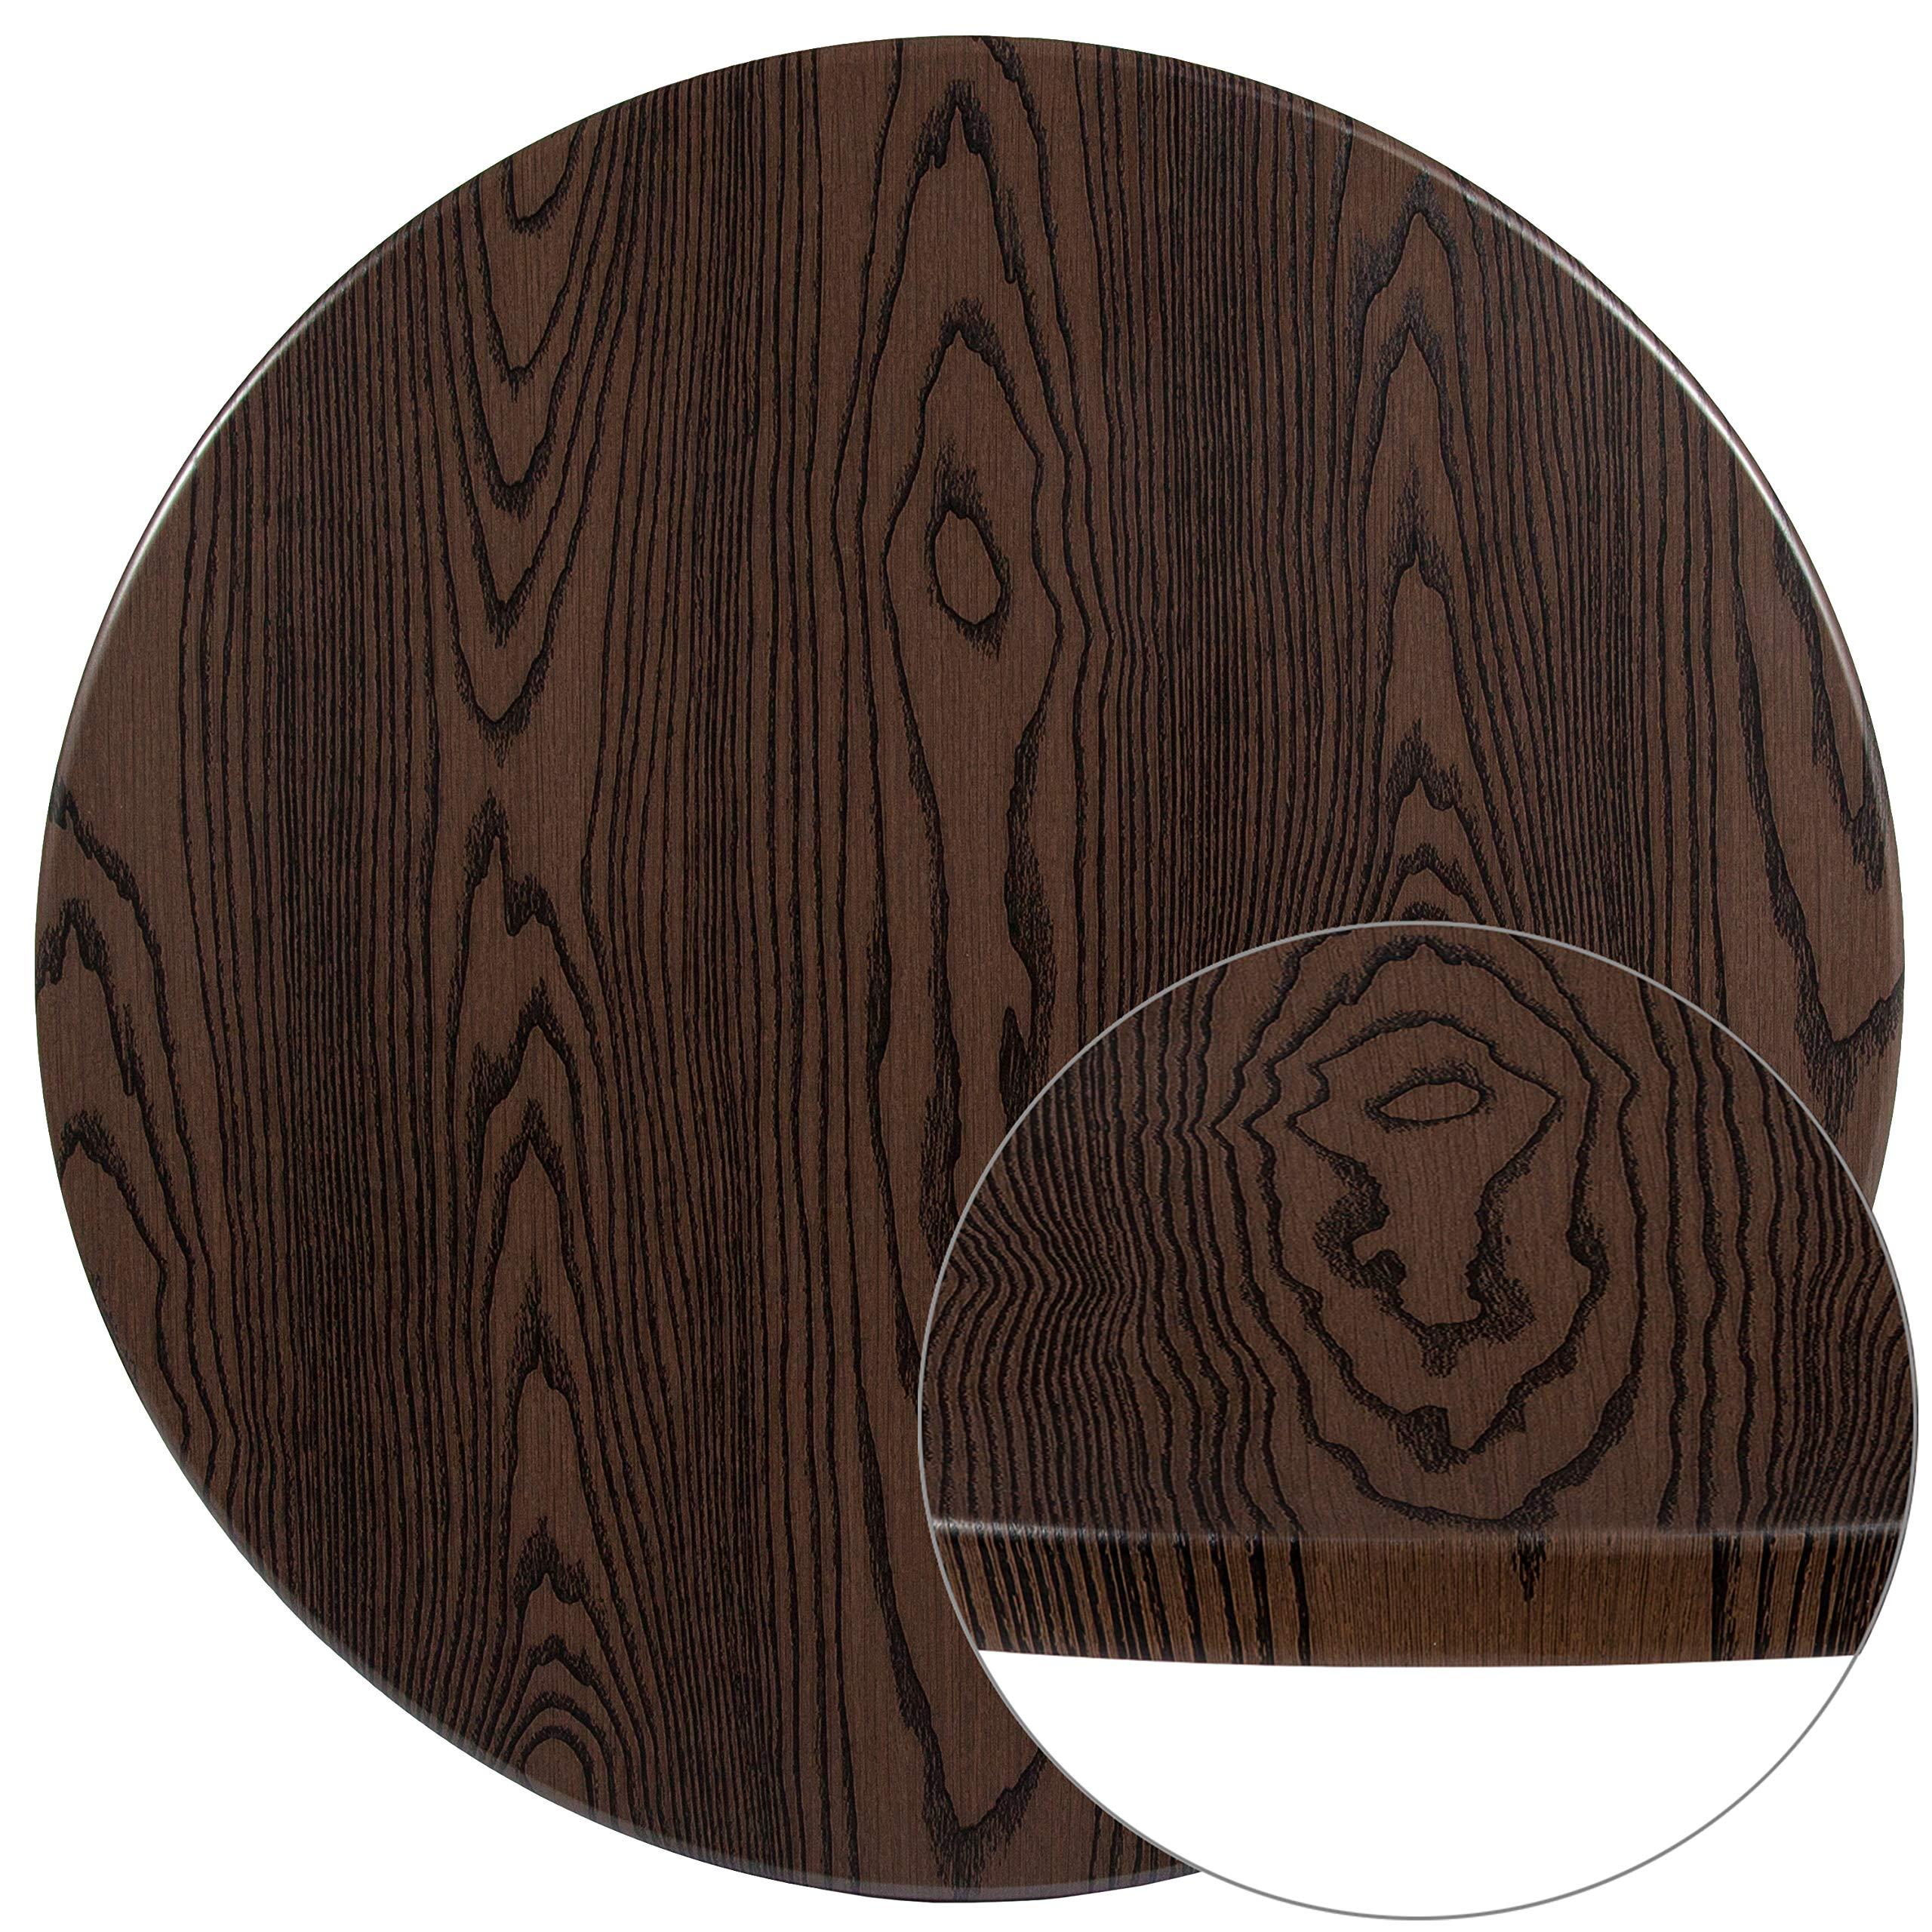 Flash Furniture XU-RD-42-WD-GG Rustic Wood Grain Laminate Restaurant Table Tops